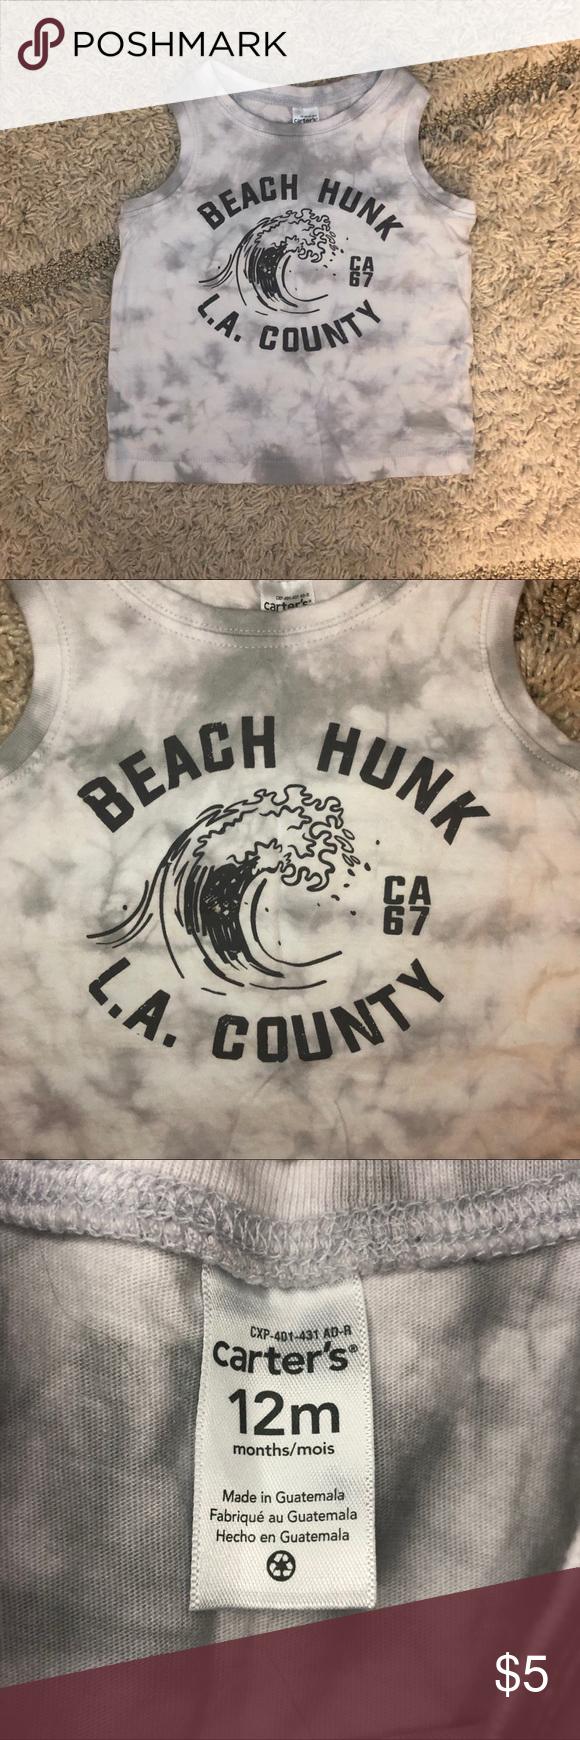 5/$20! Carter's Beach Hunk Muscle Tank NWOT Never Worn 12